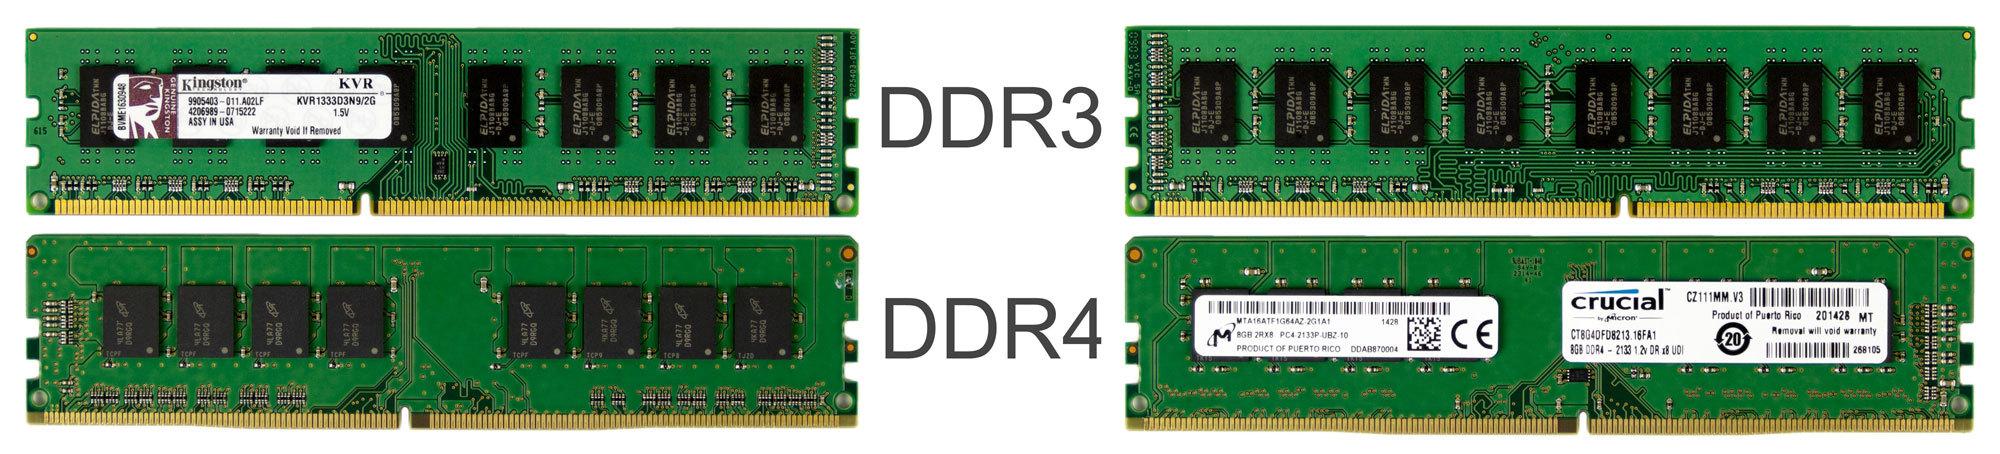 DDR3 versus DDR4 size